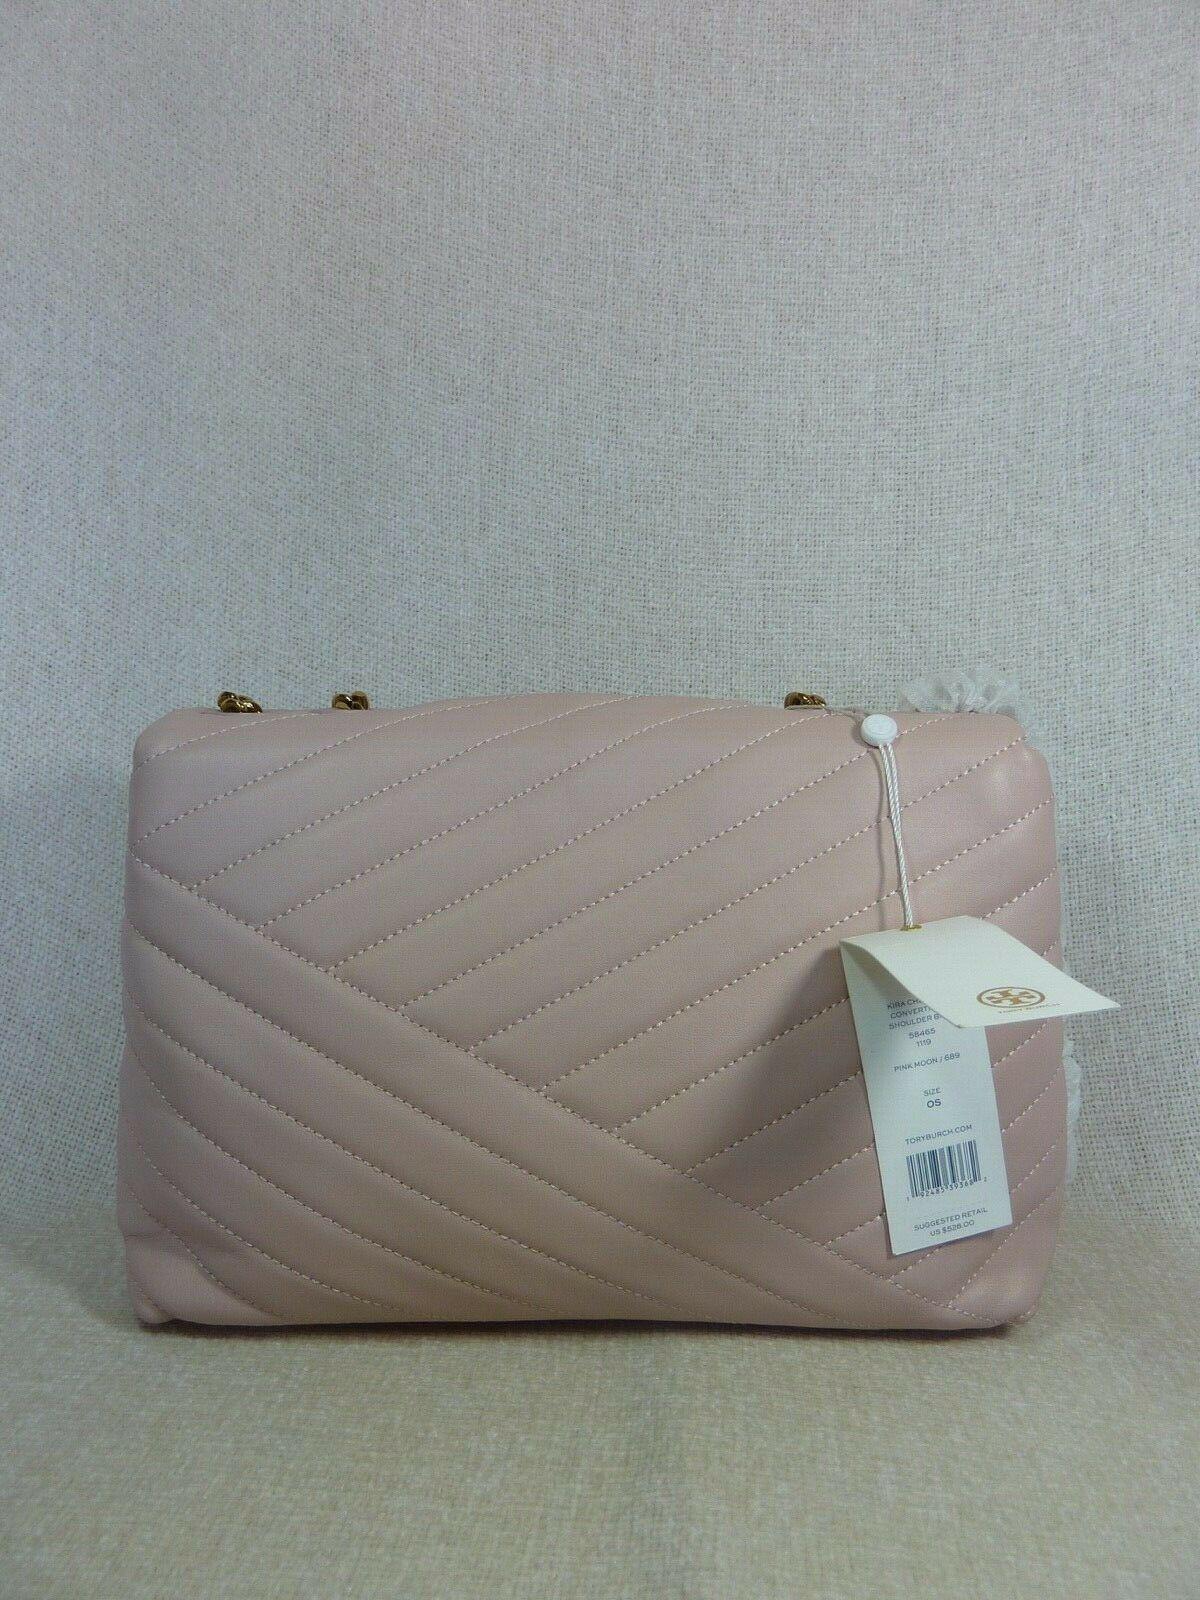 NWT Tory Burch Pink Moon Kira Chevron Convertible Shoulder Bag $528 image 7